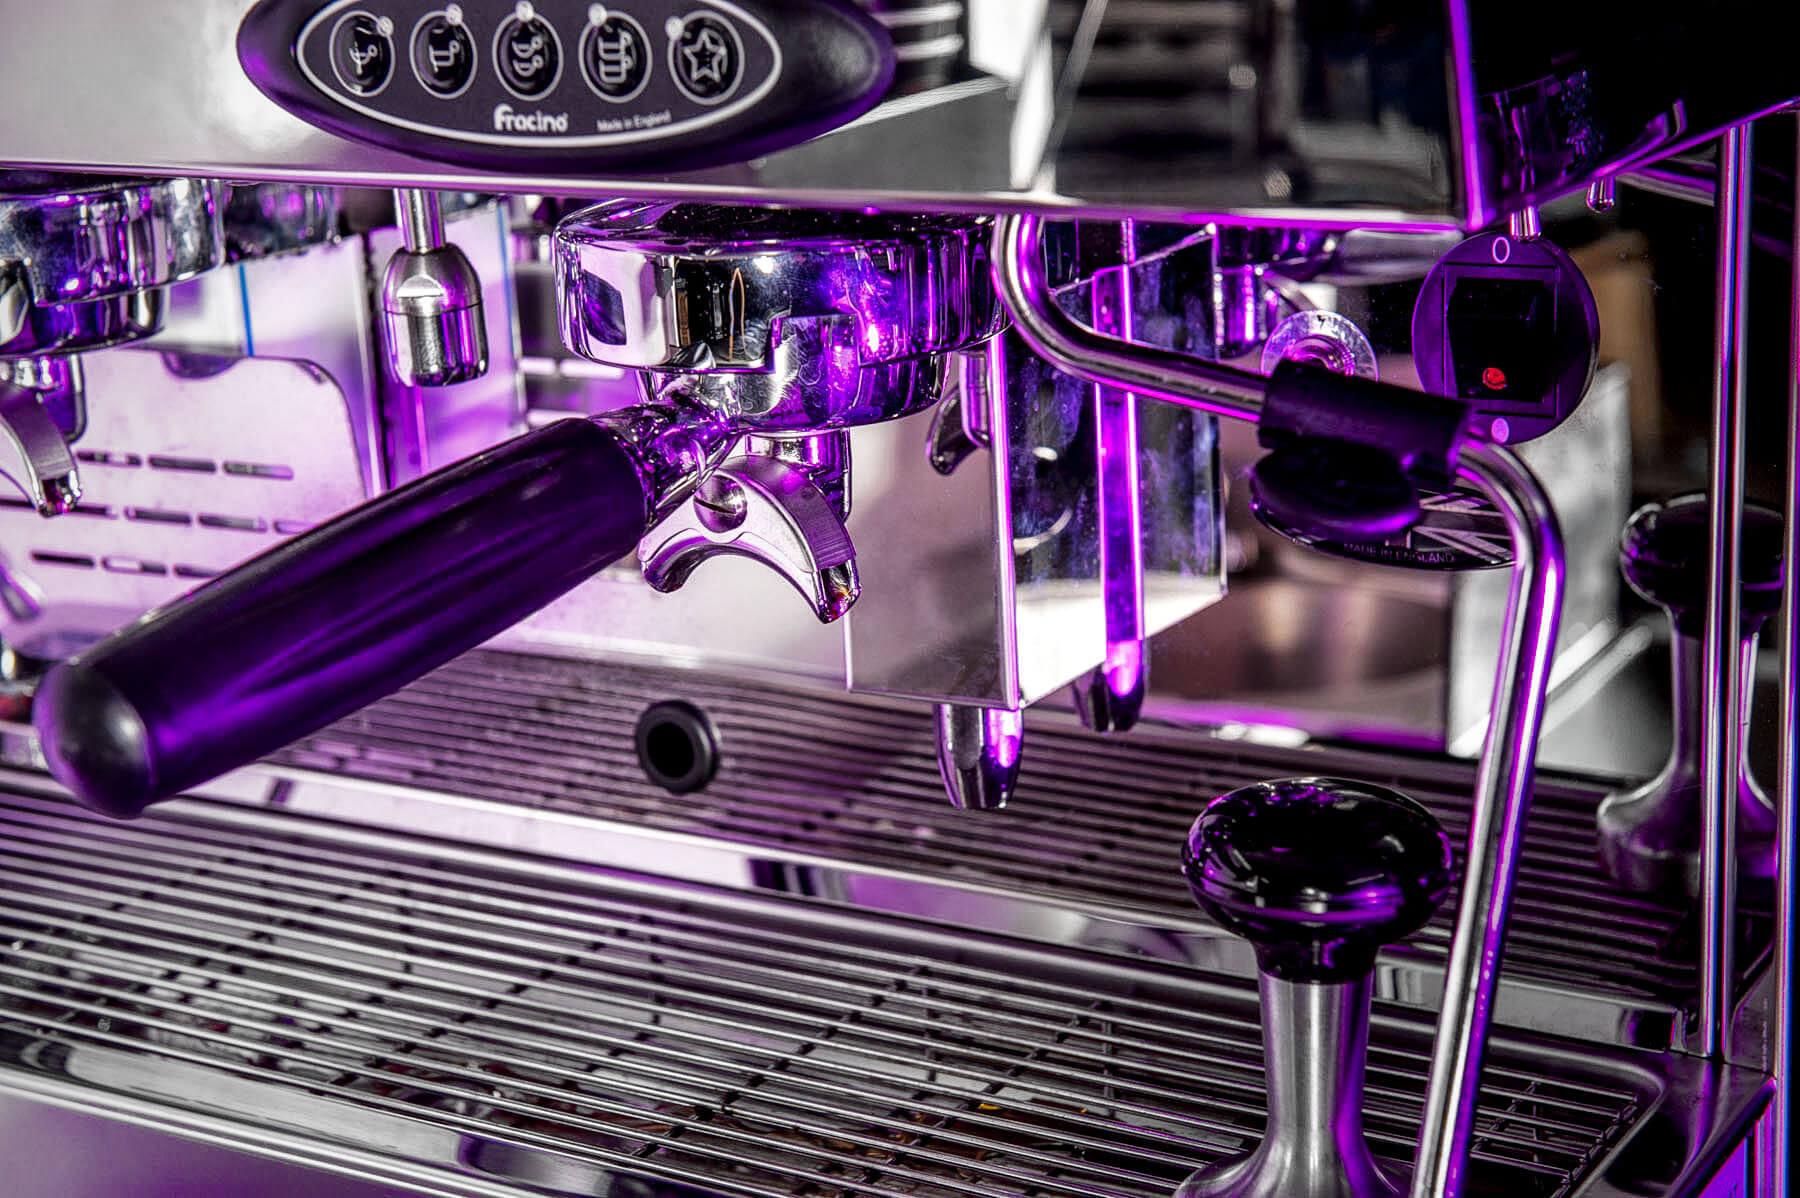 Fracino Coffee Machine - Mobile Coffee Van